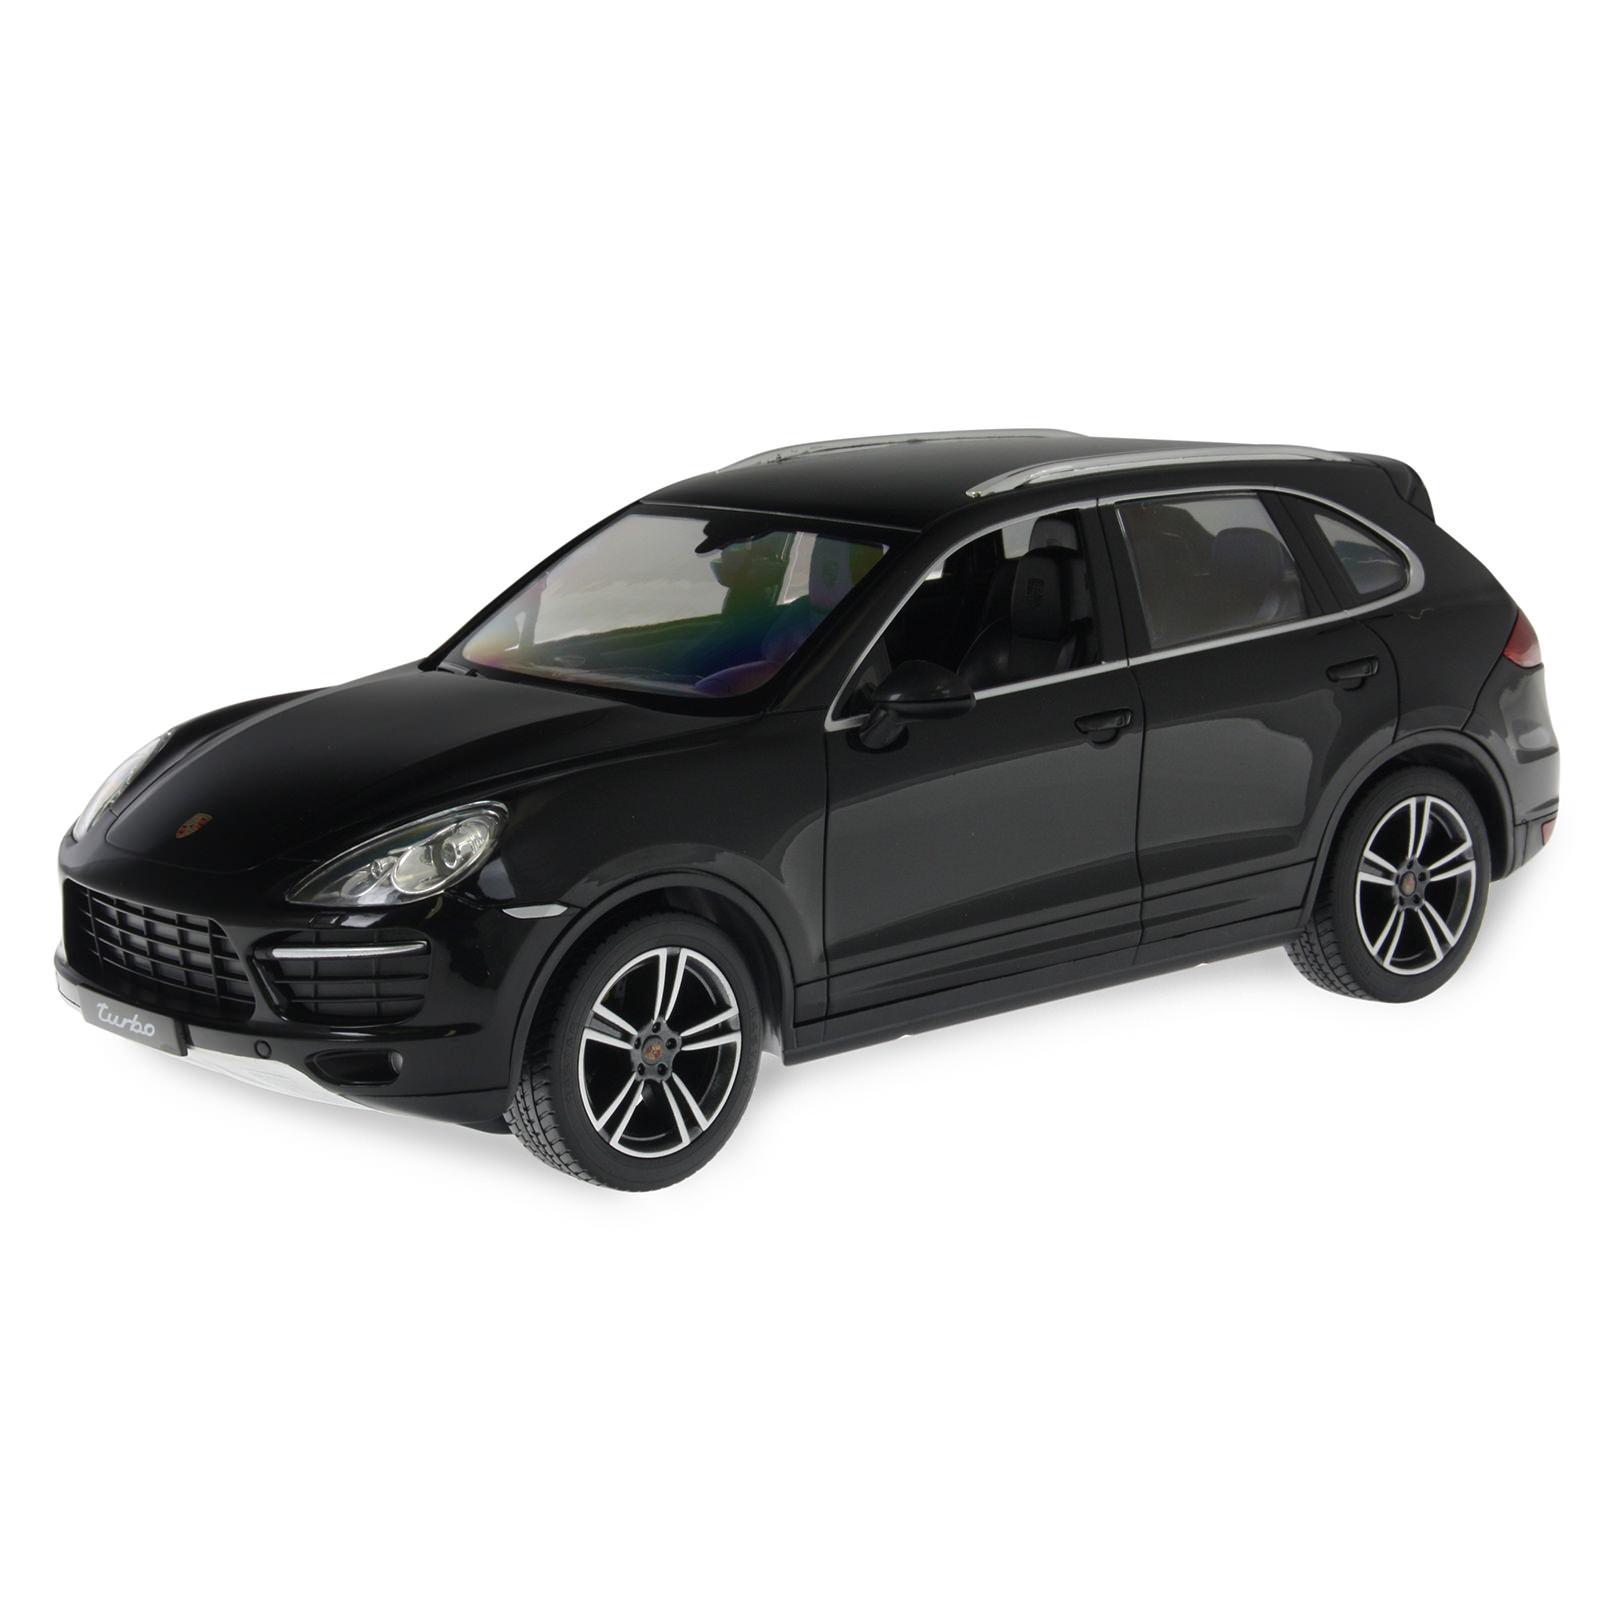 Black Porsche Cayenne: Rastar 42900 Black RC Car At Hobby Warehouse